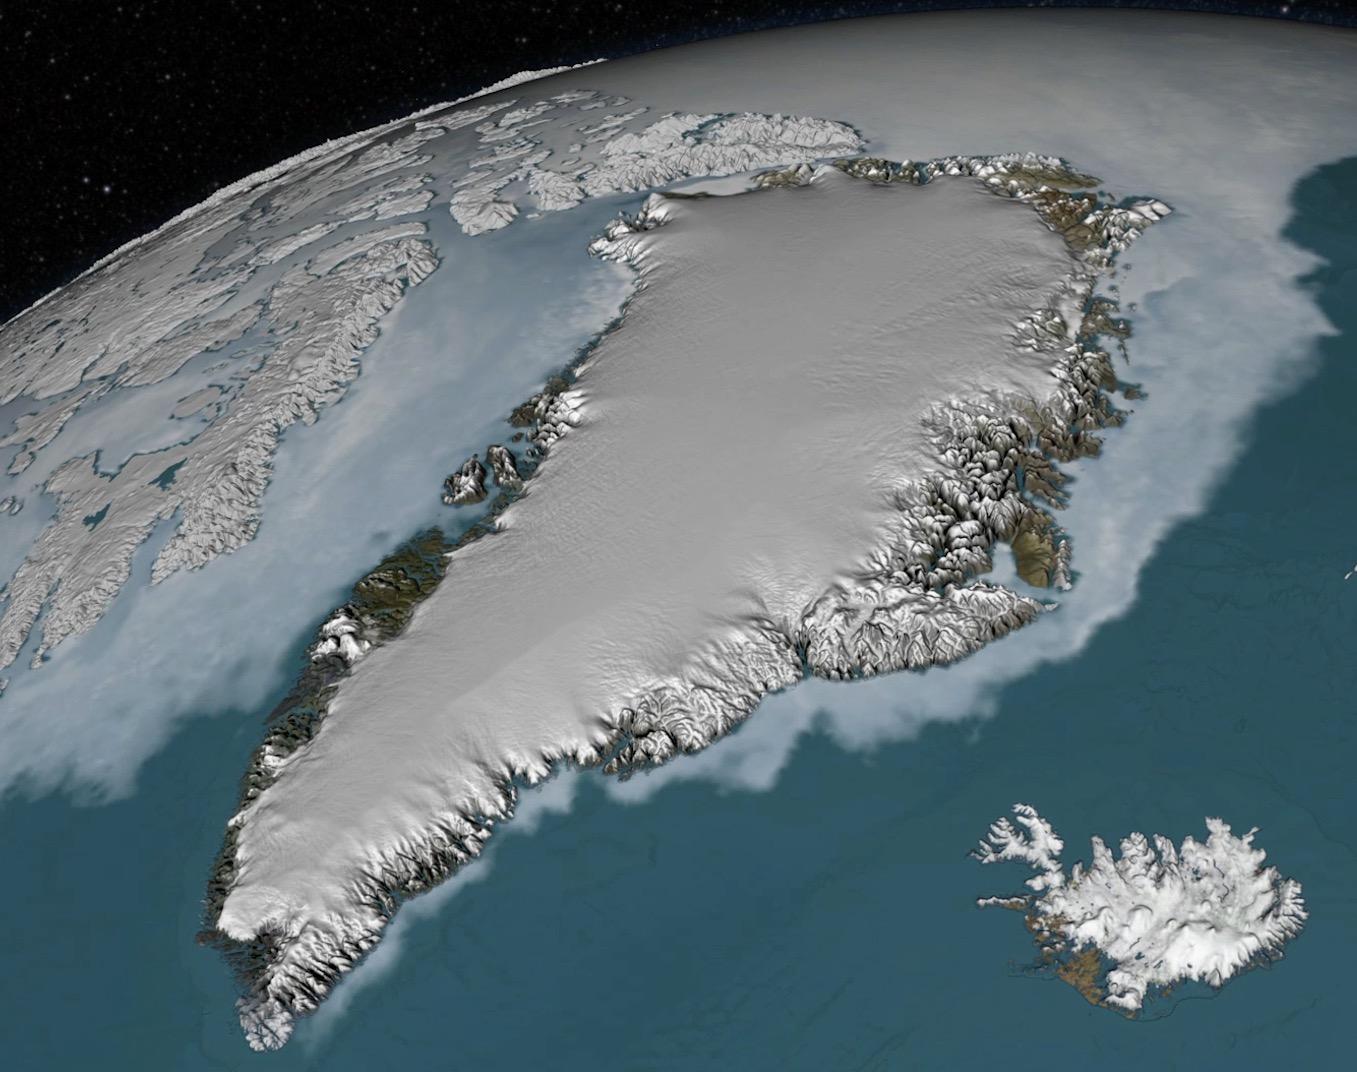 climatechangedispatch-com.cdn.ampproject.org